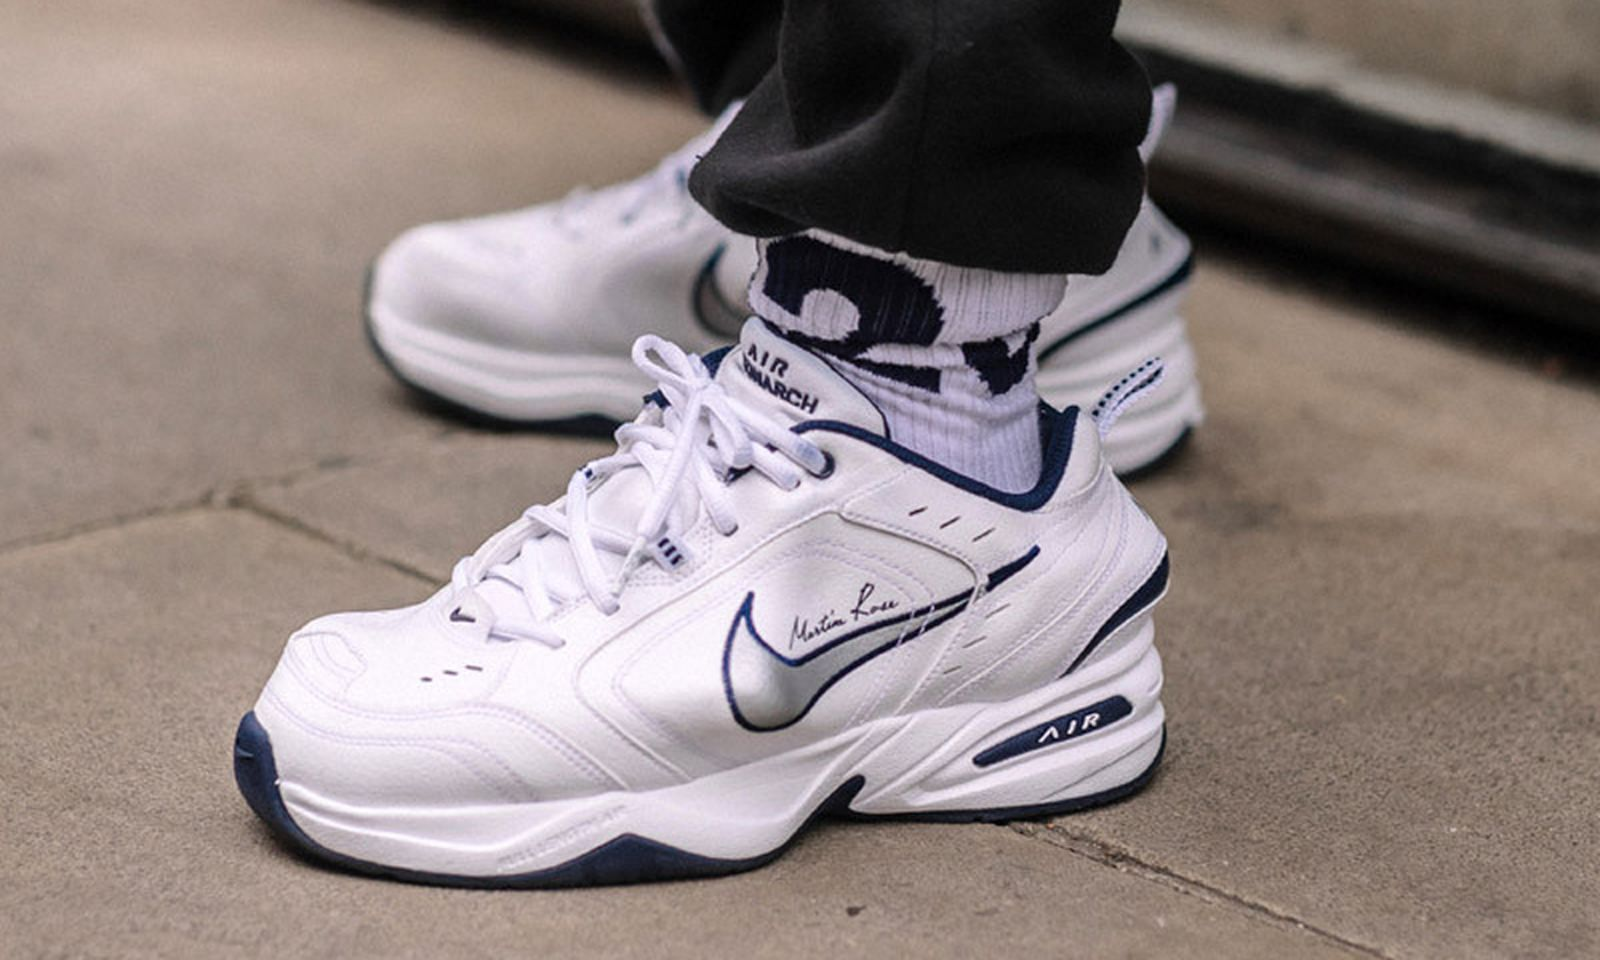 sneaker street style london fw19 comments Air Jordan 19 Lil Pump Martine Rose